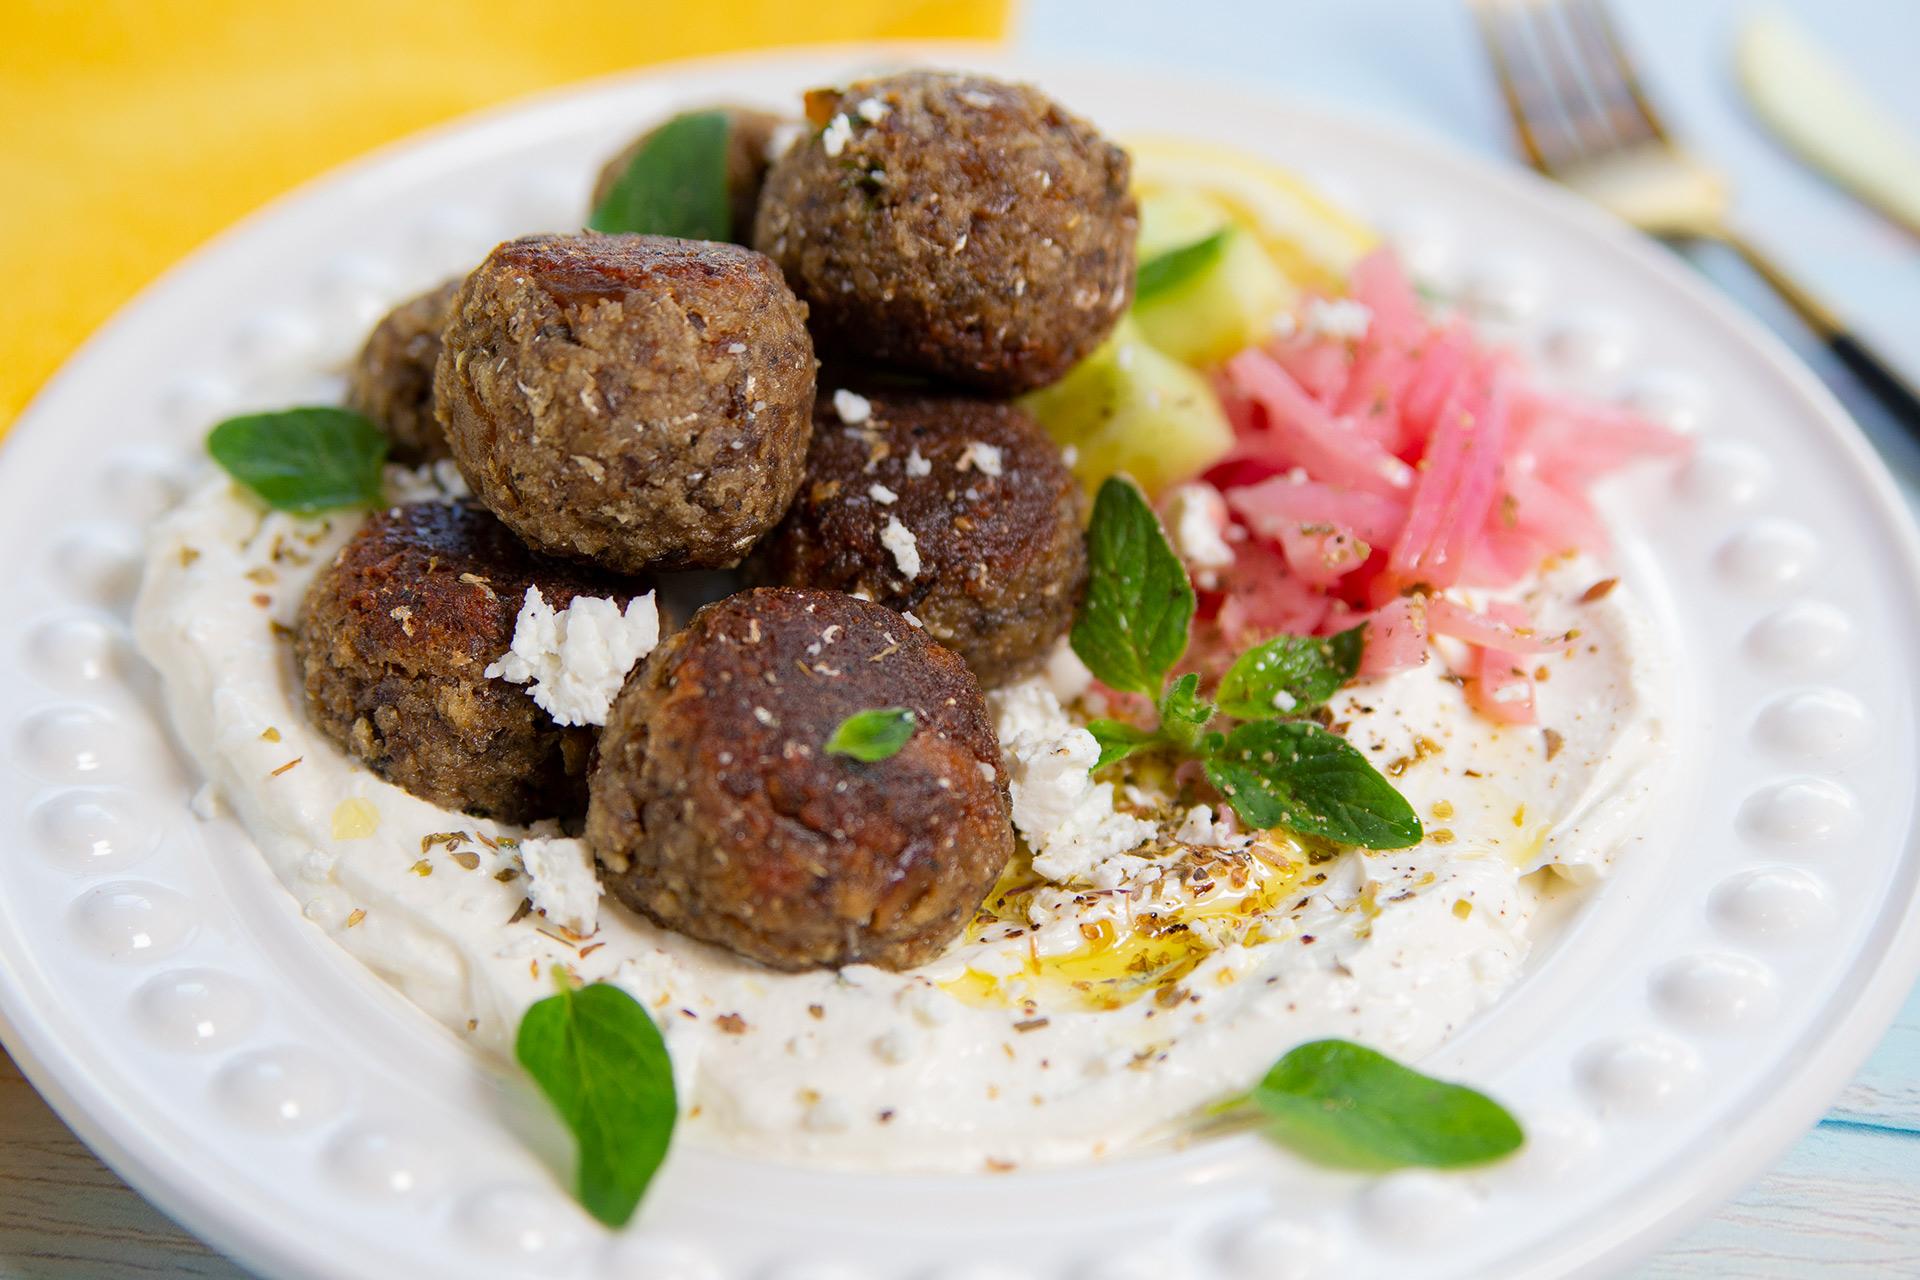 Mediterranean Meatball Platter